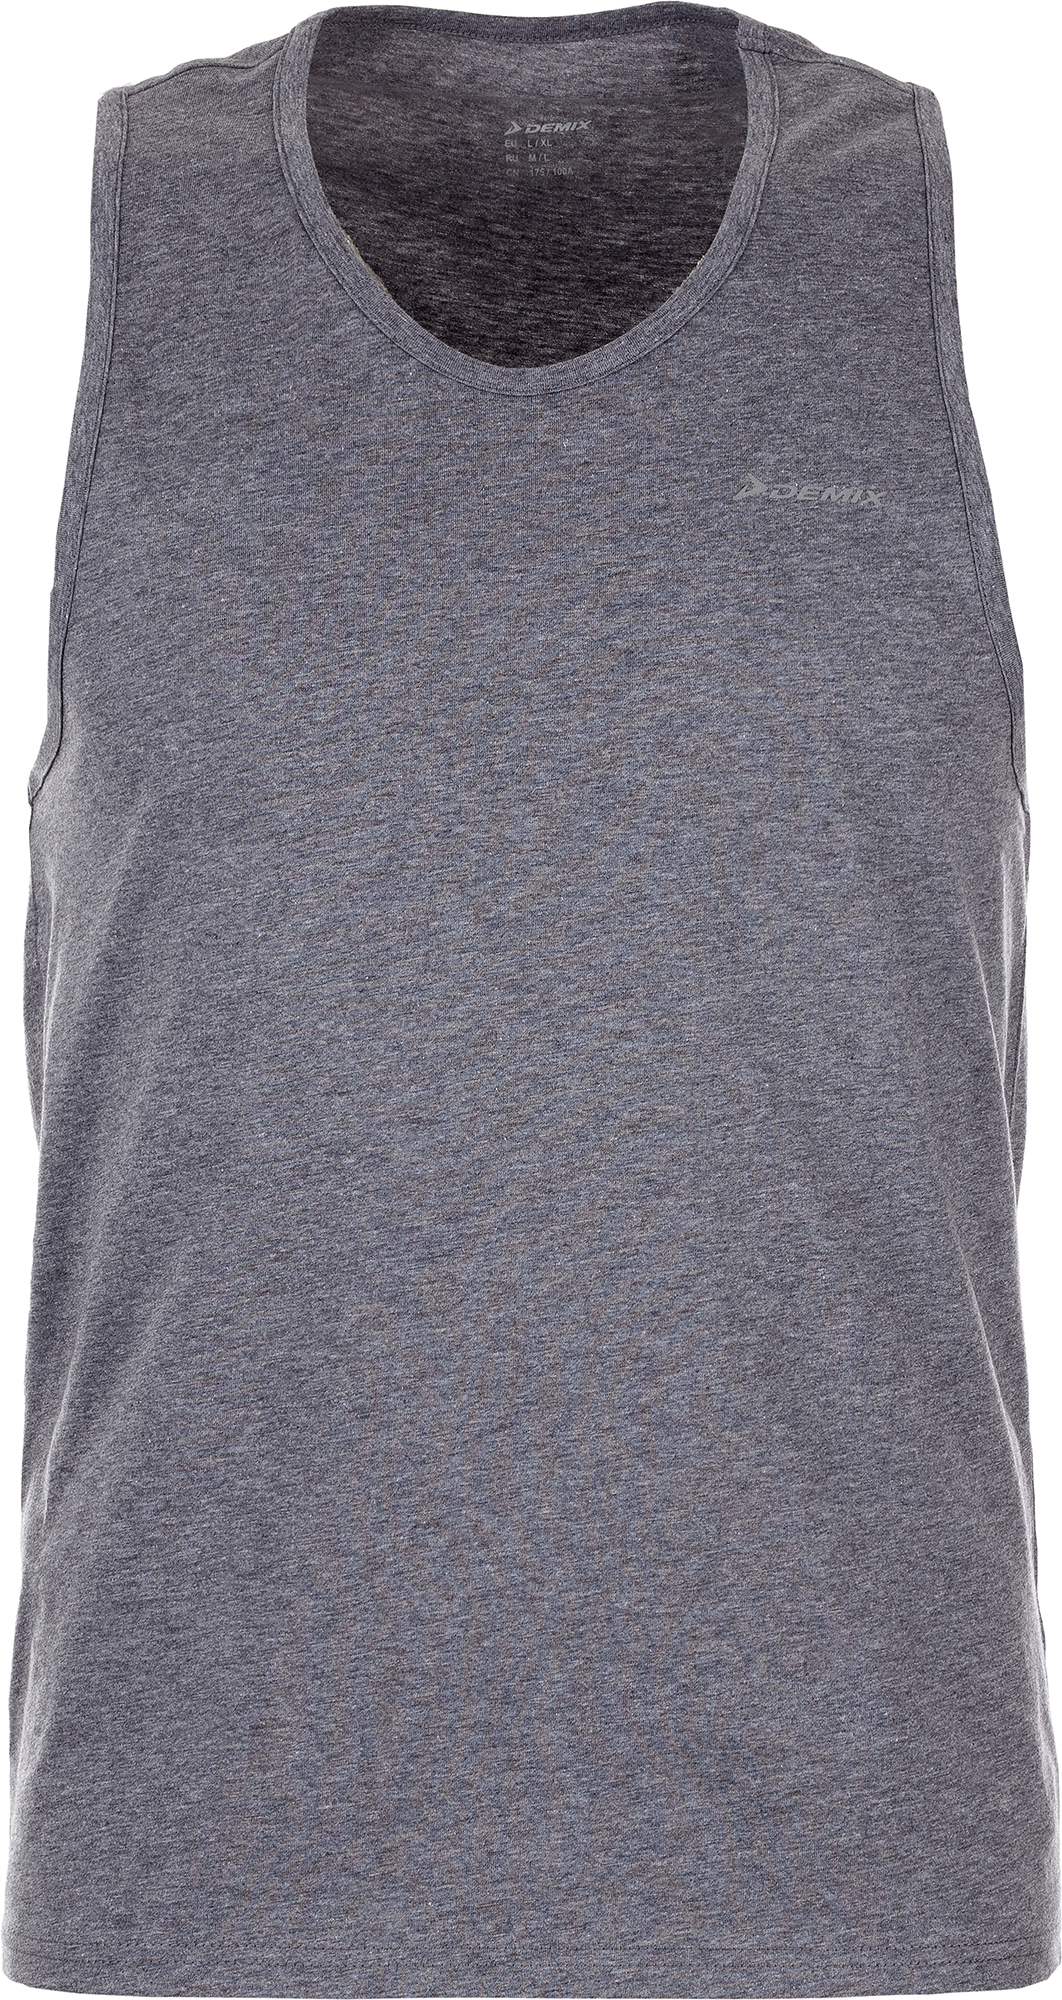 Demix Майка мужская Demix playboy модная мужская футболка